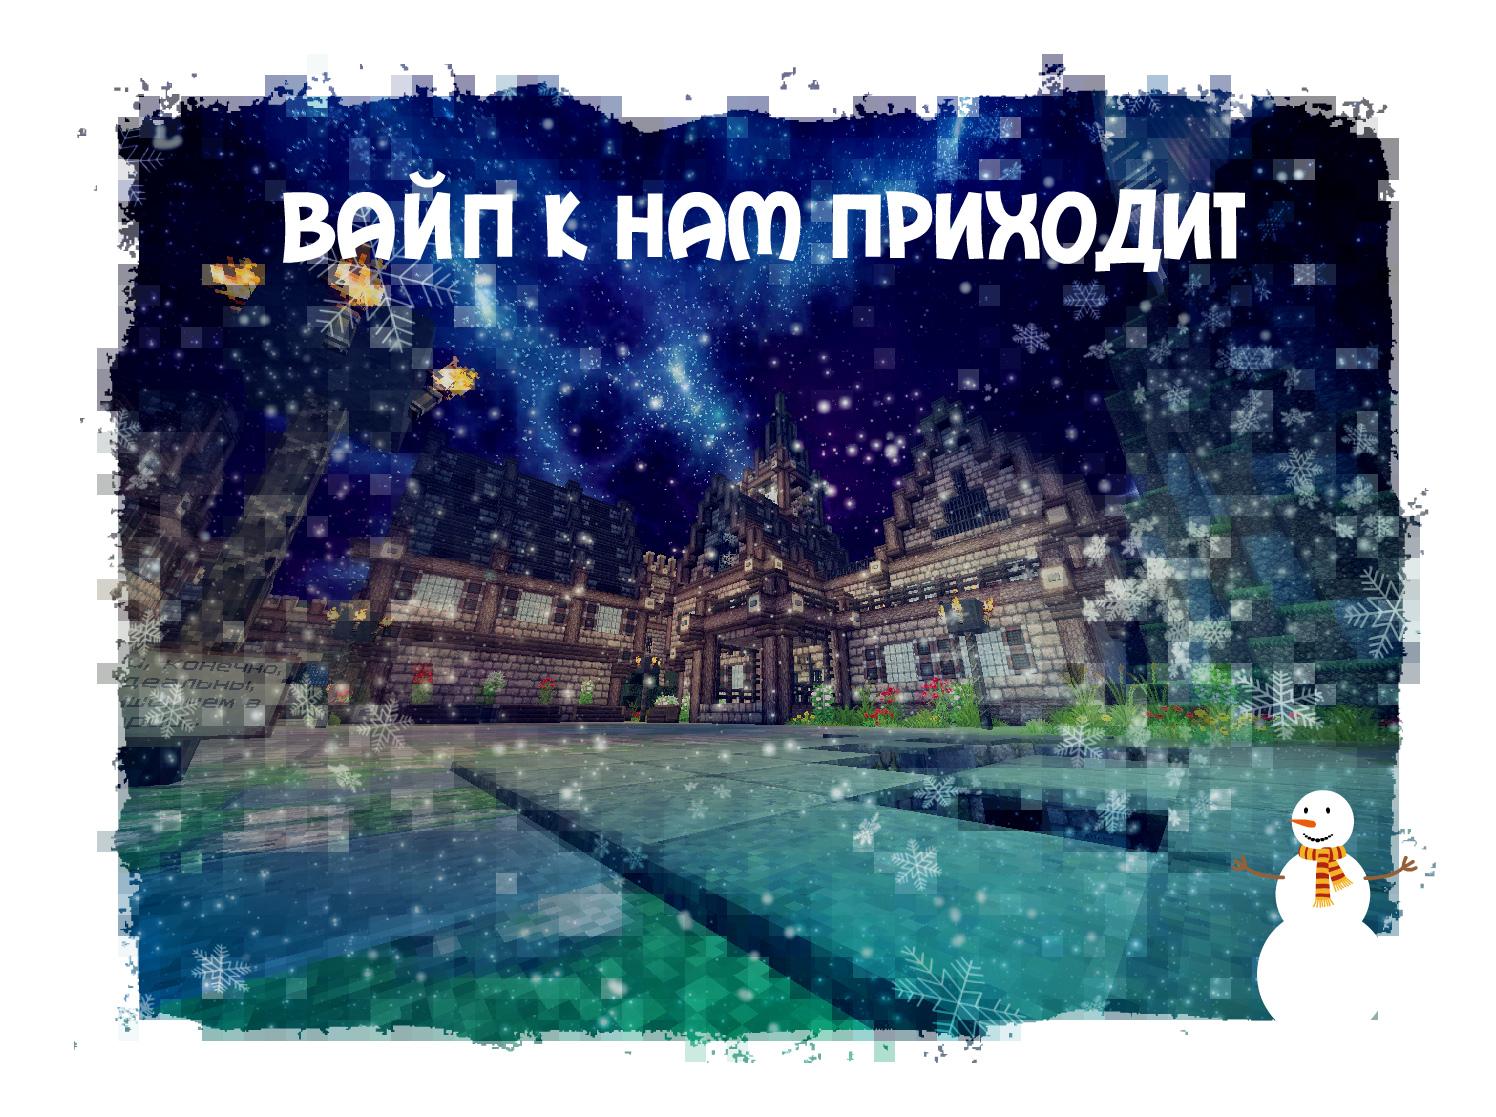 http://images.vfl.ru/ii/1513437910/f6c65e75/19819264.jpg